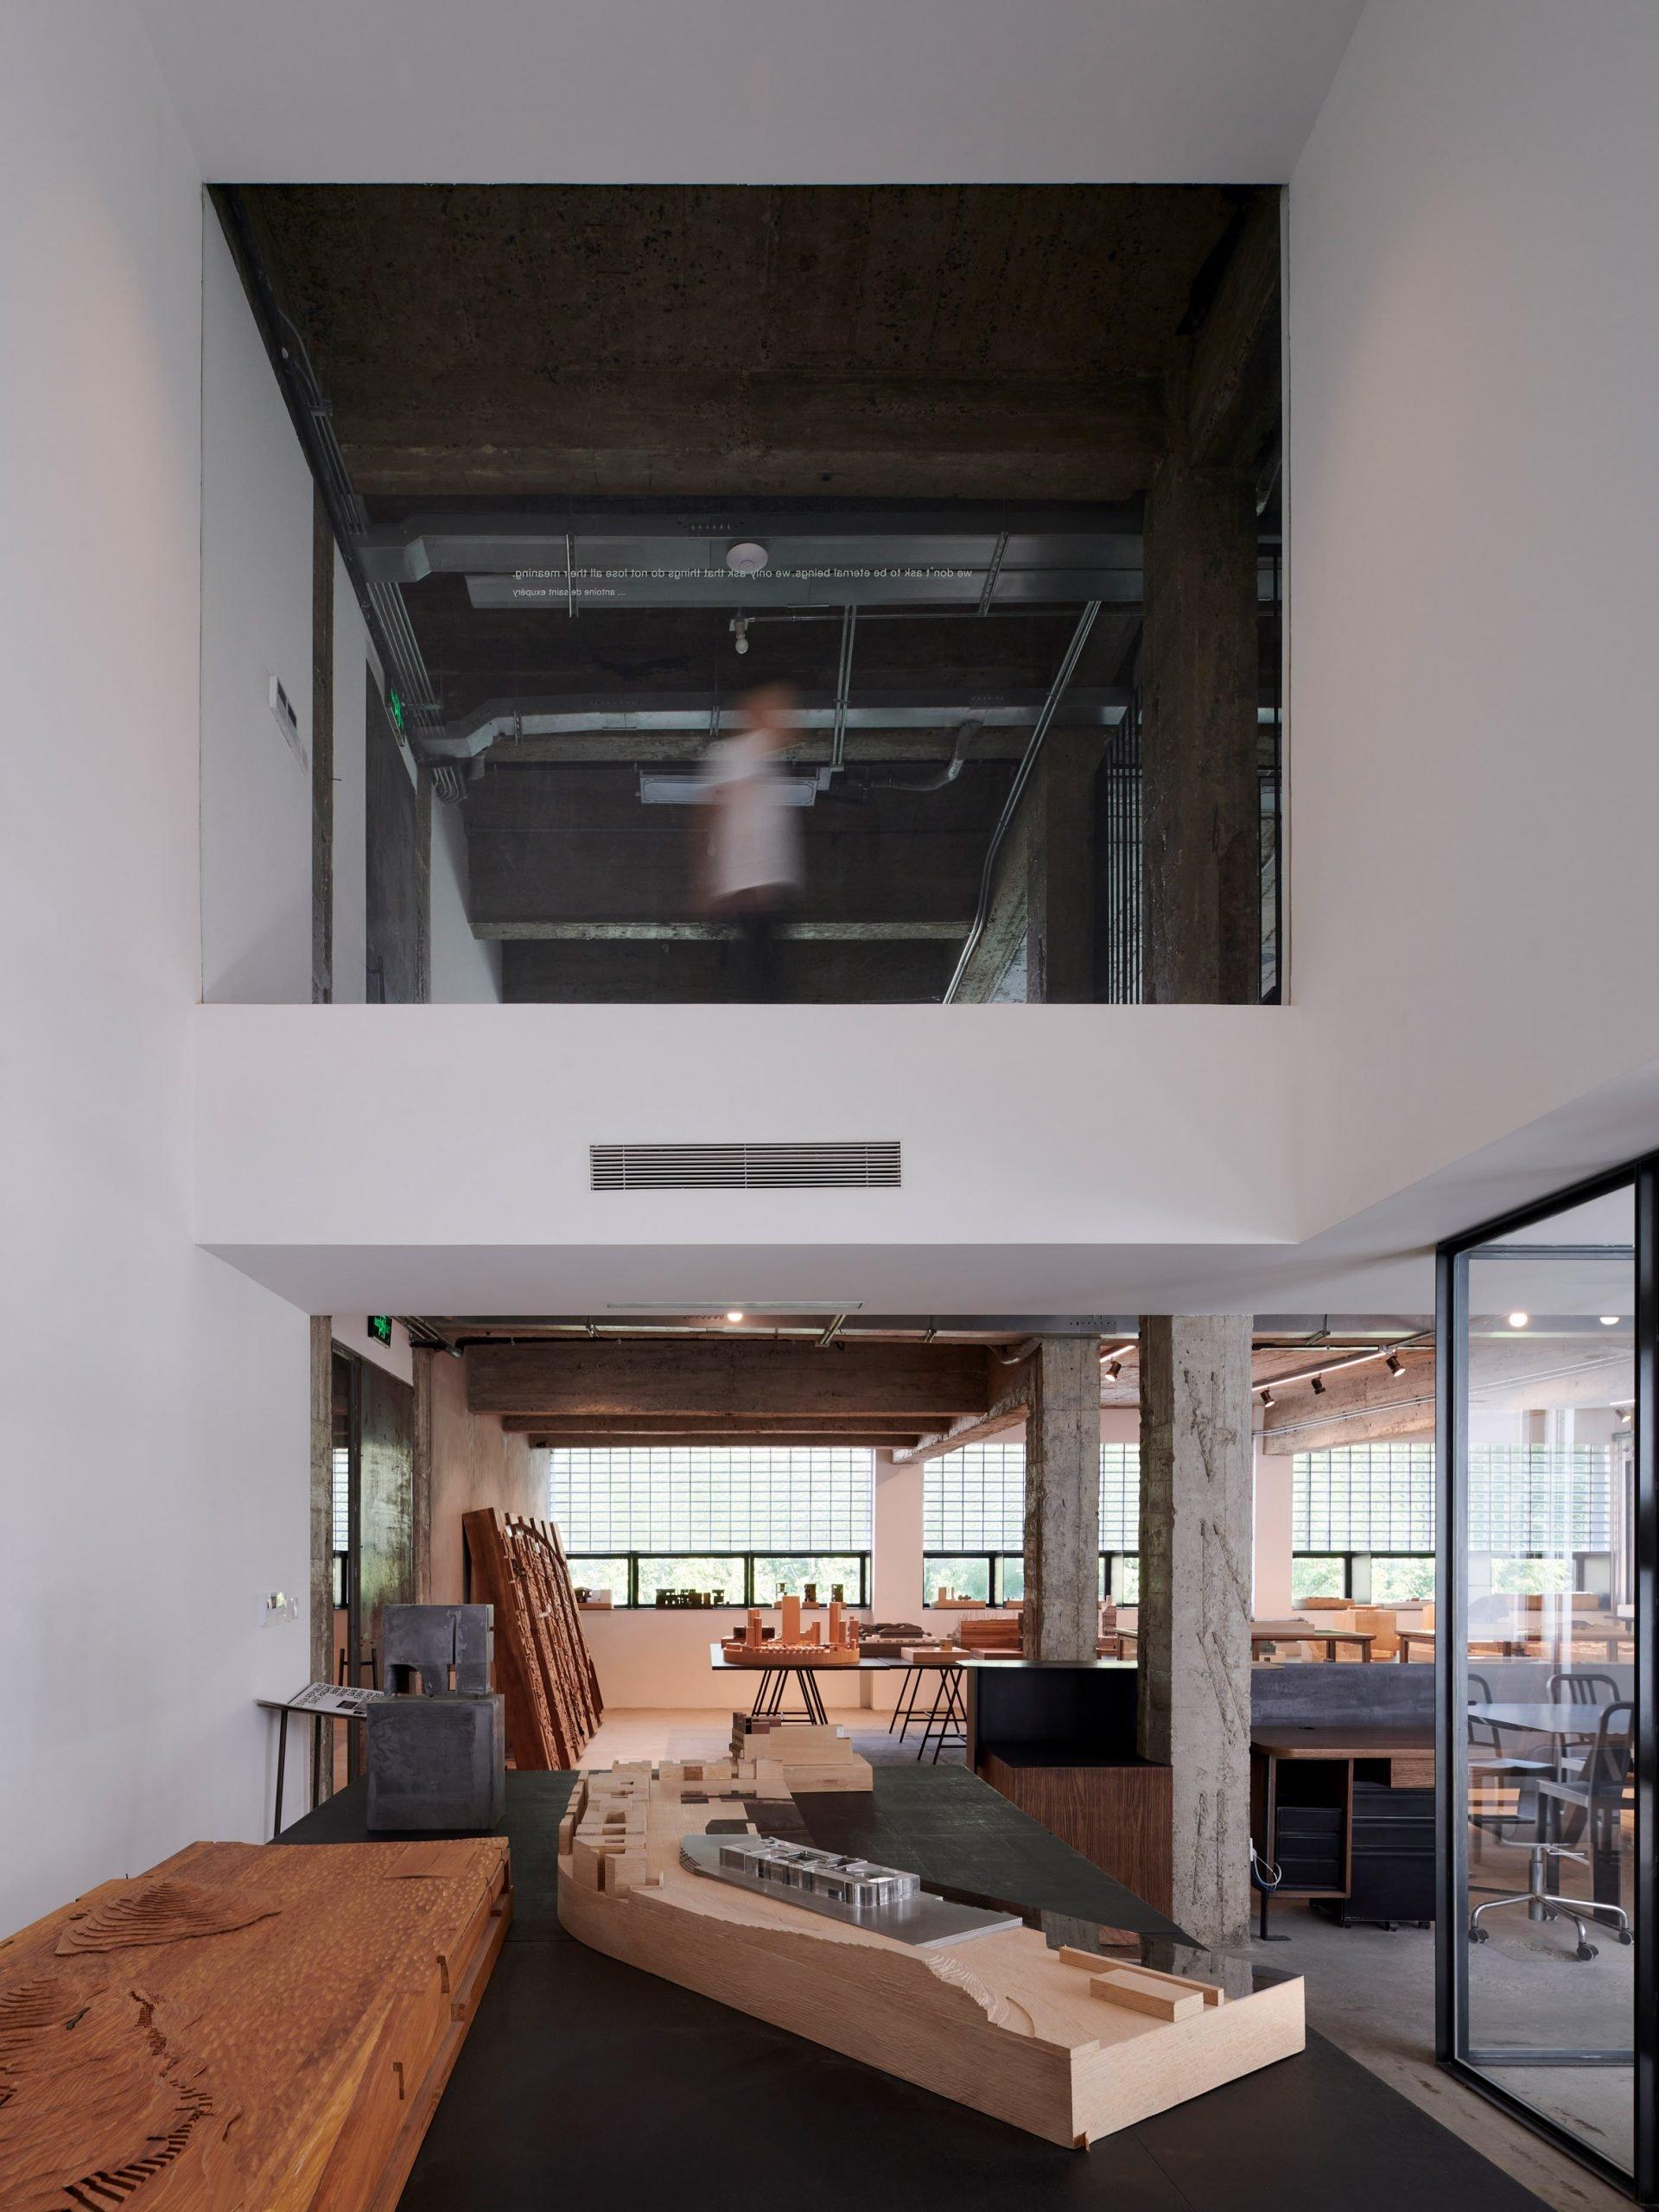 Neri&Hu architecture studio